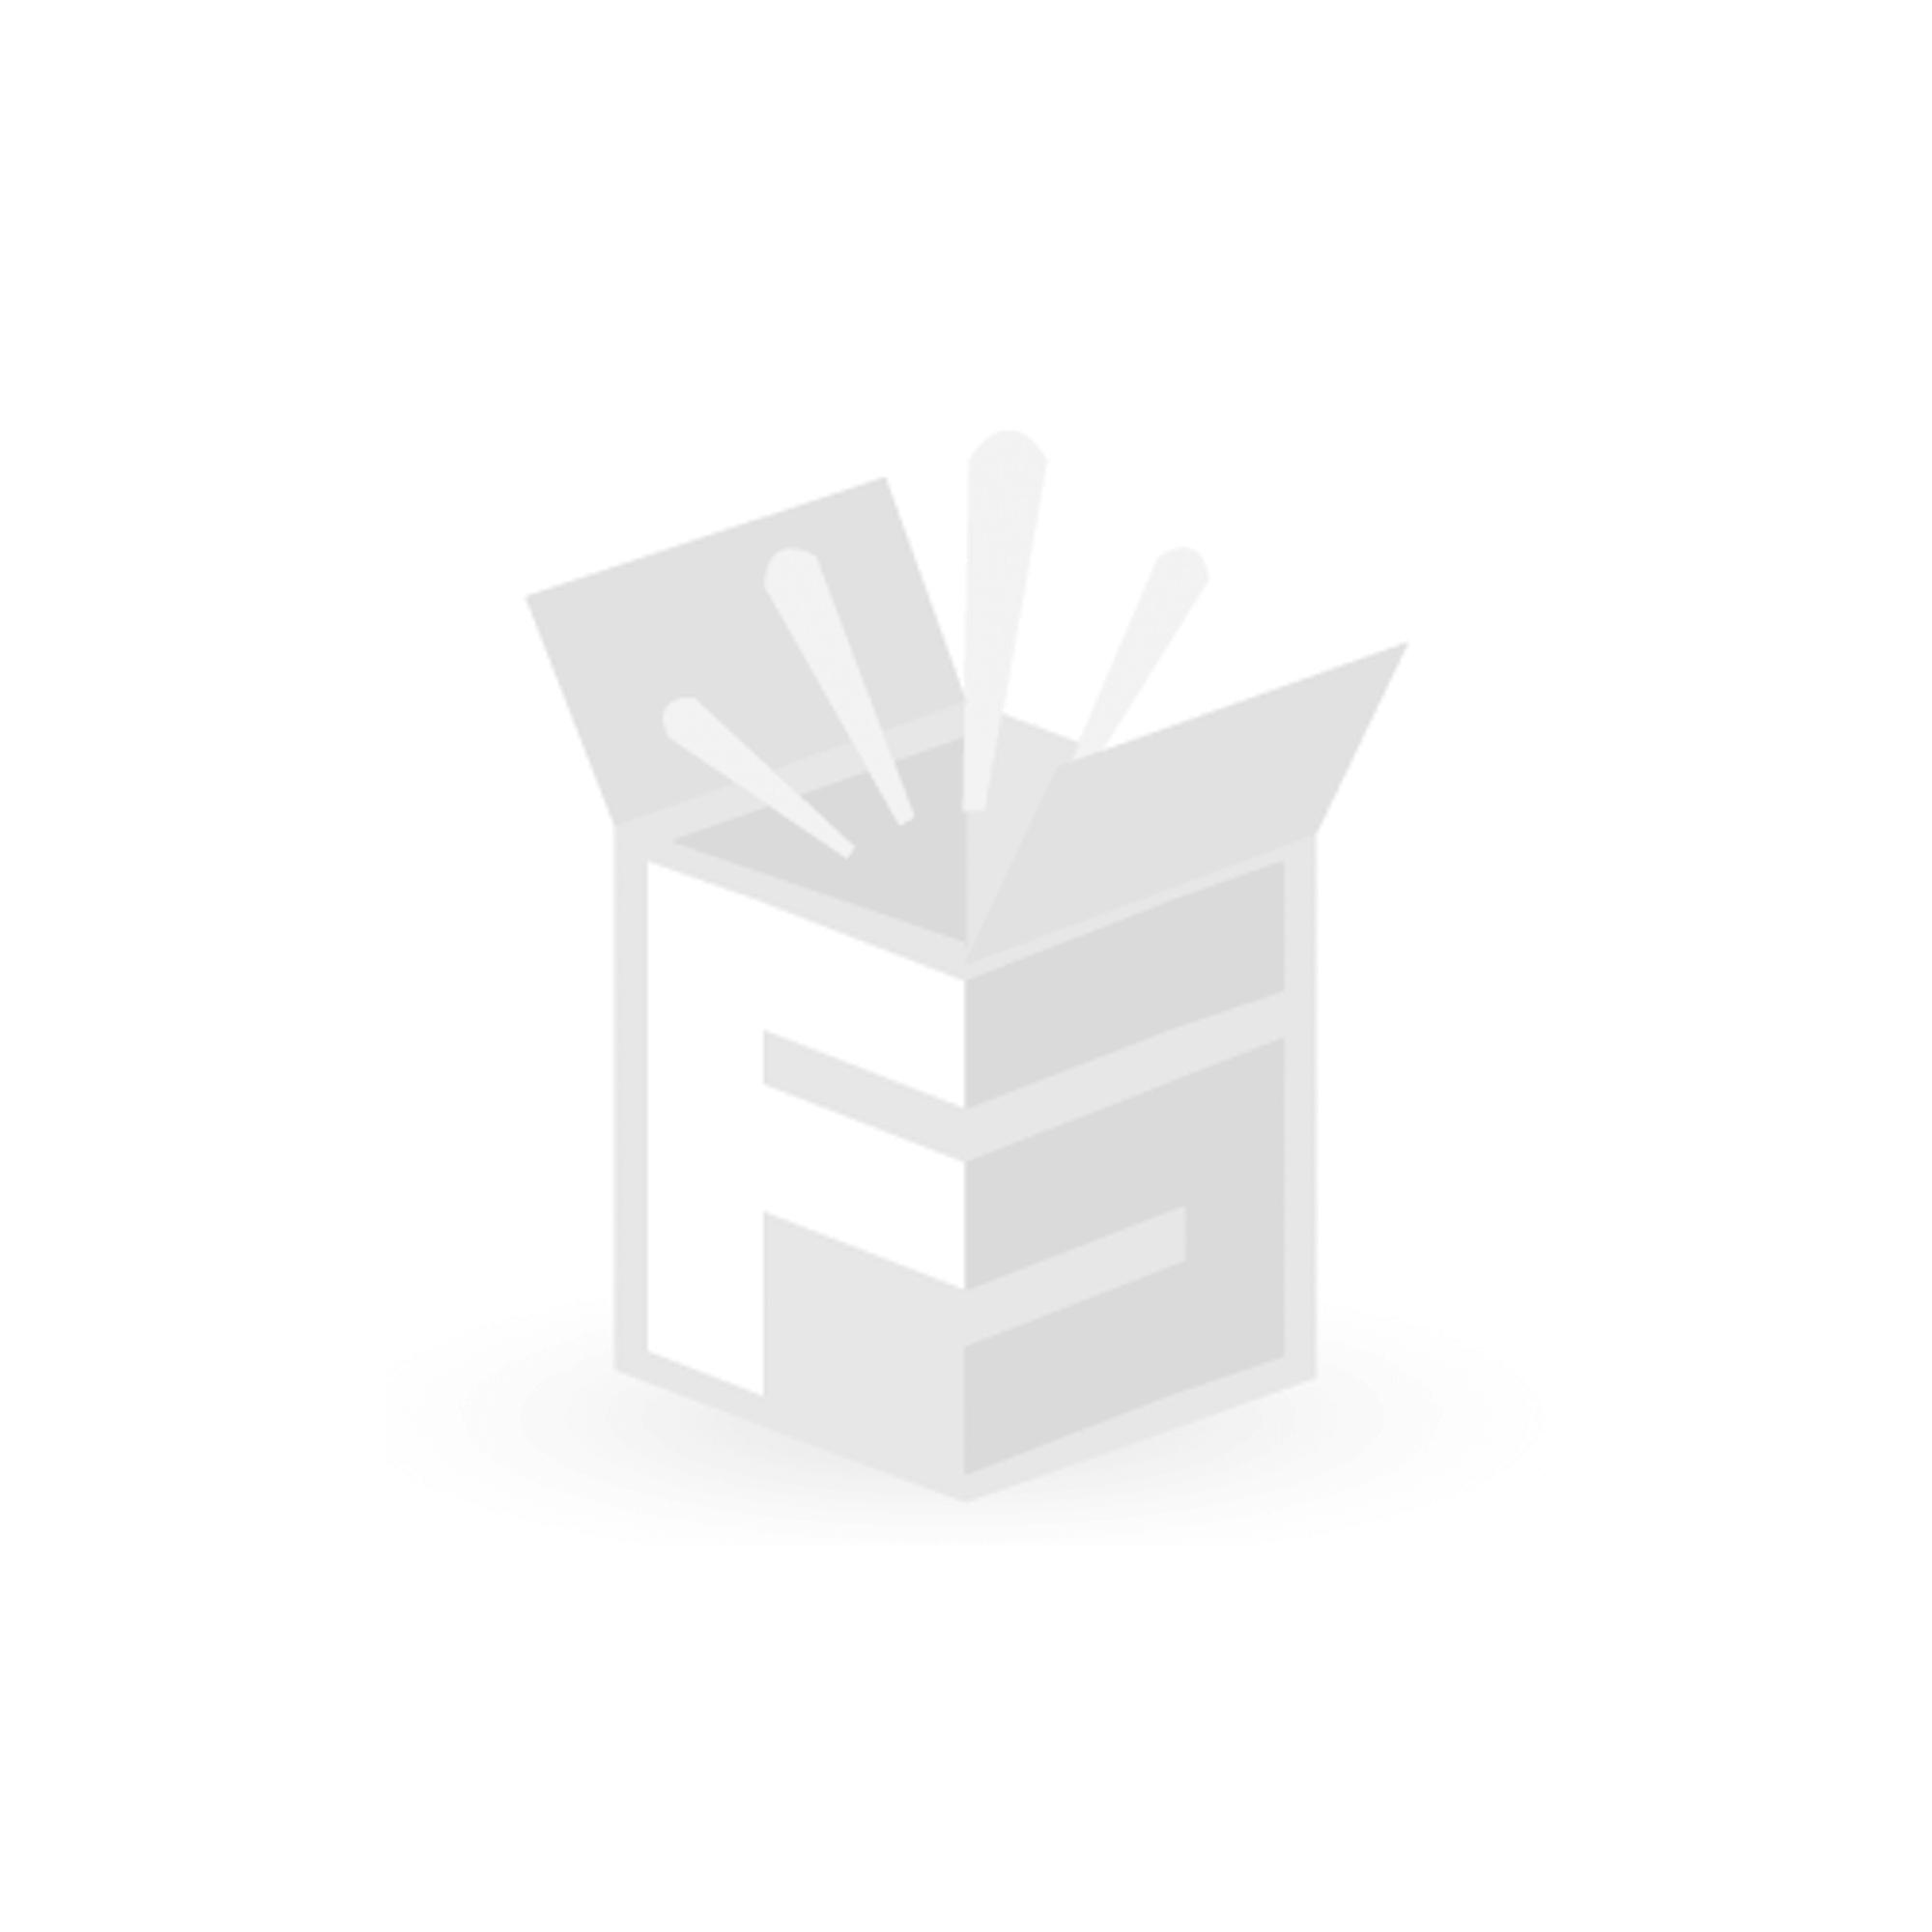 Solis Standmixer Perfect Blender Pro Typ 824